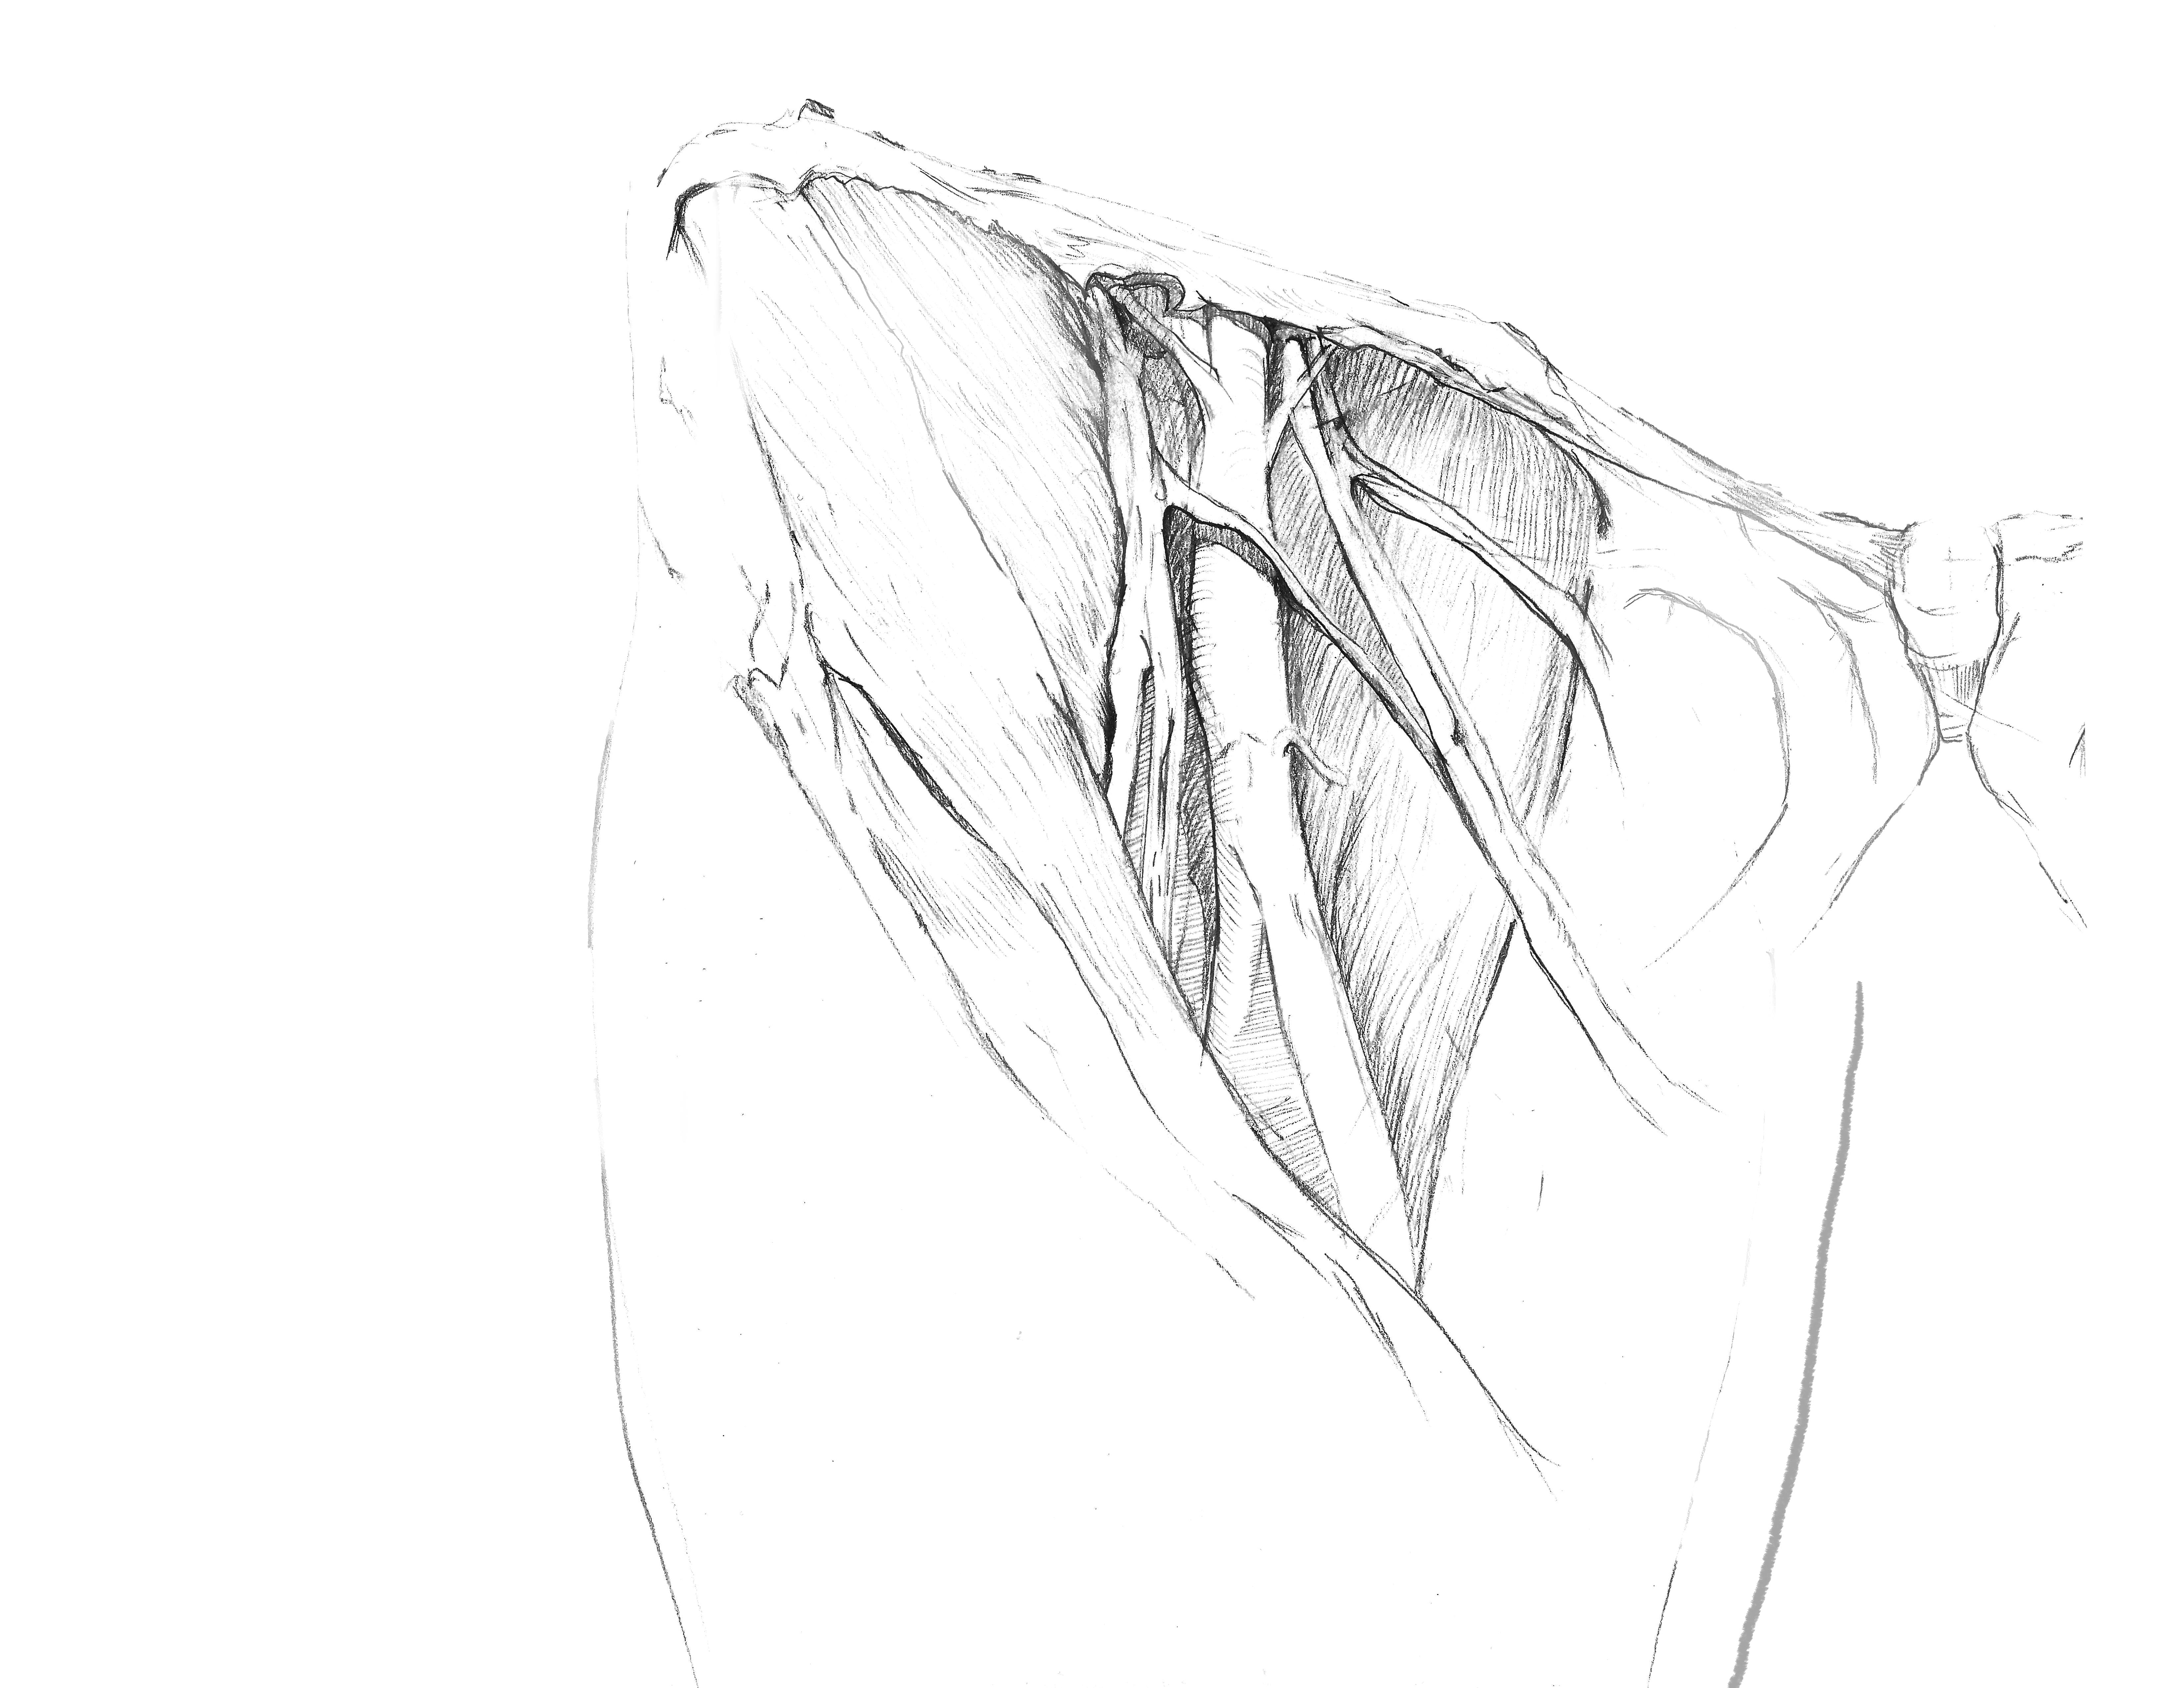 Femoral triangle sketch